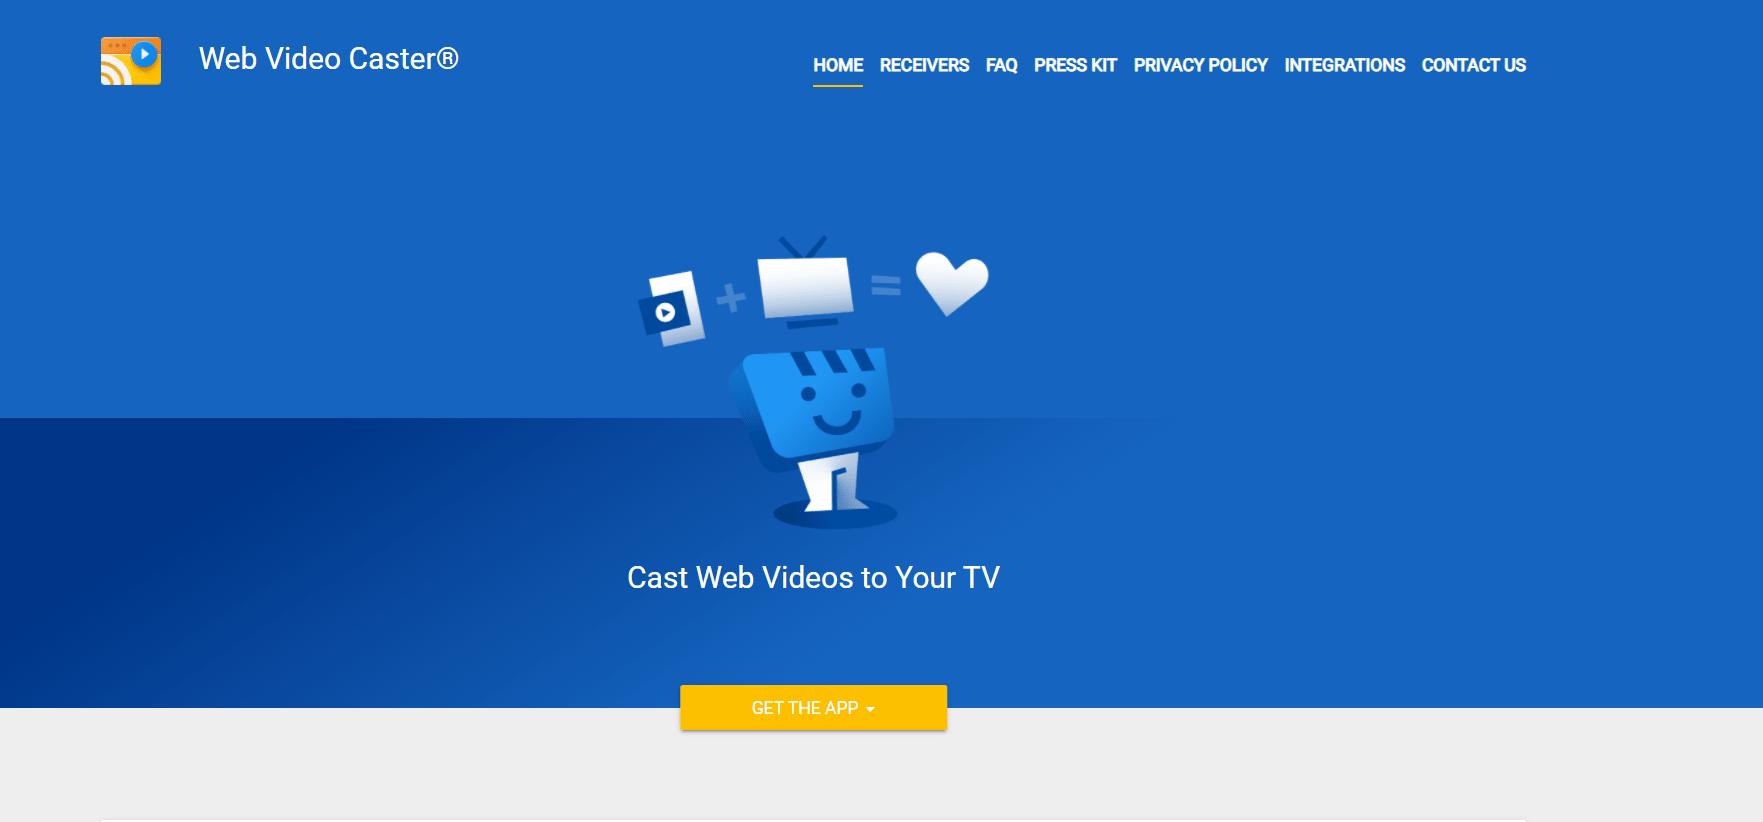 Web Video Caster